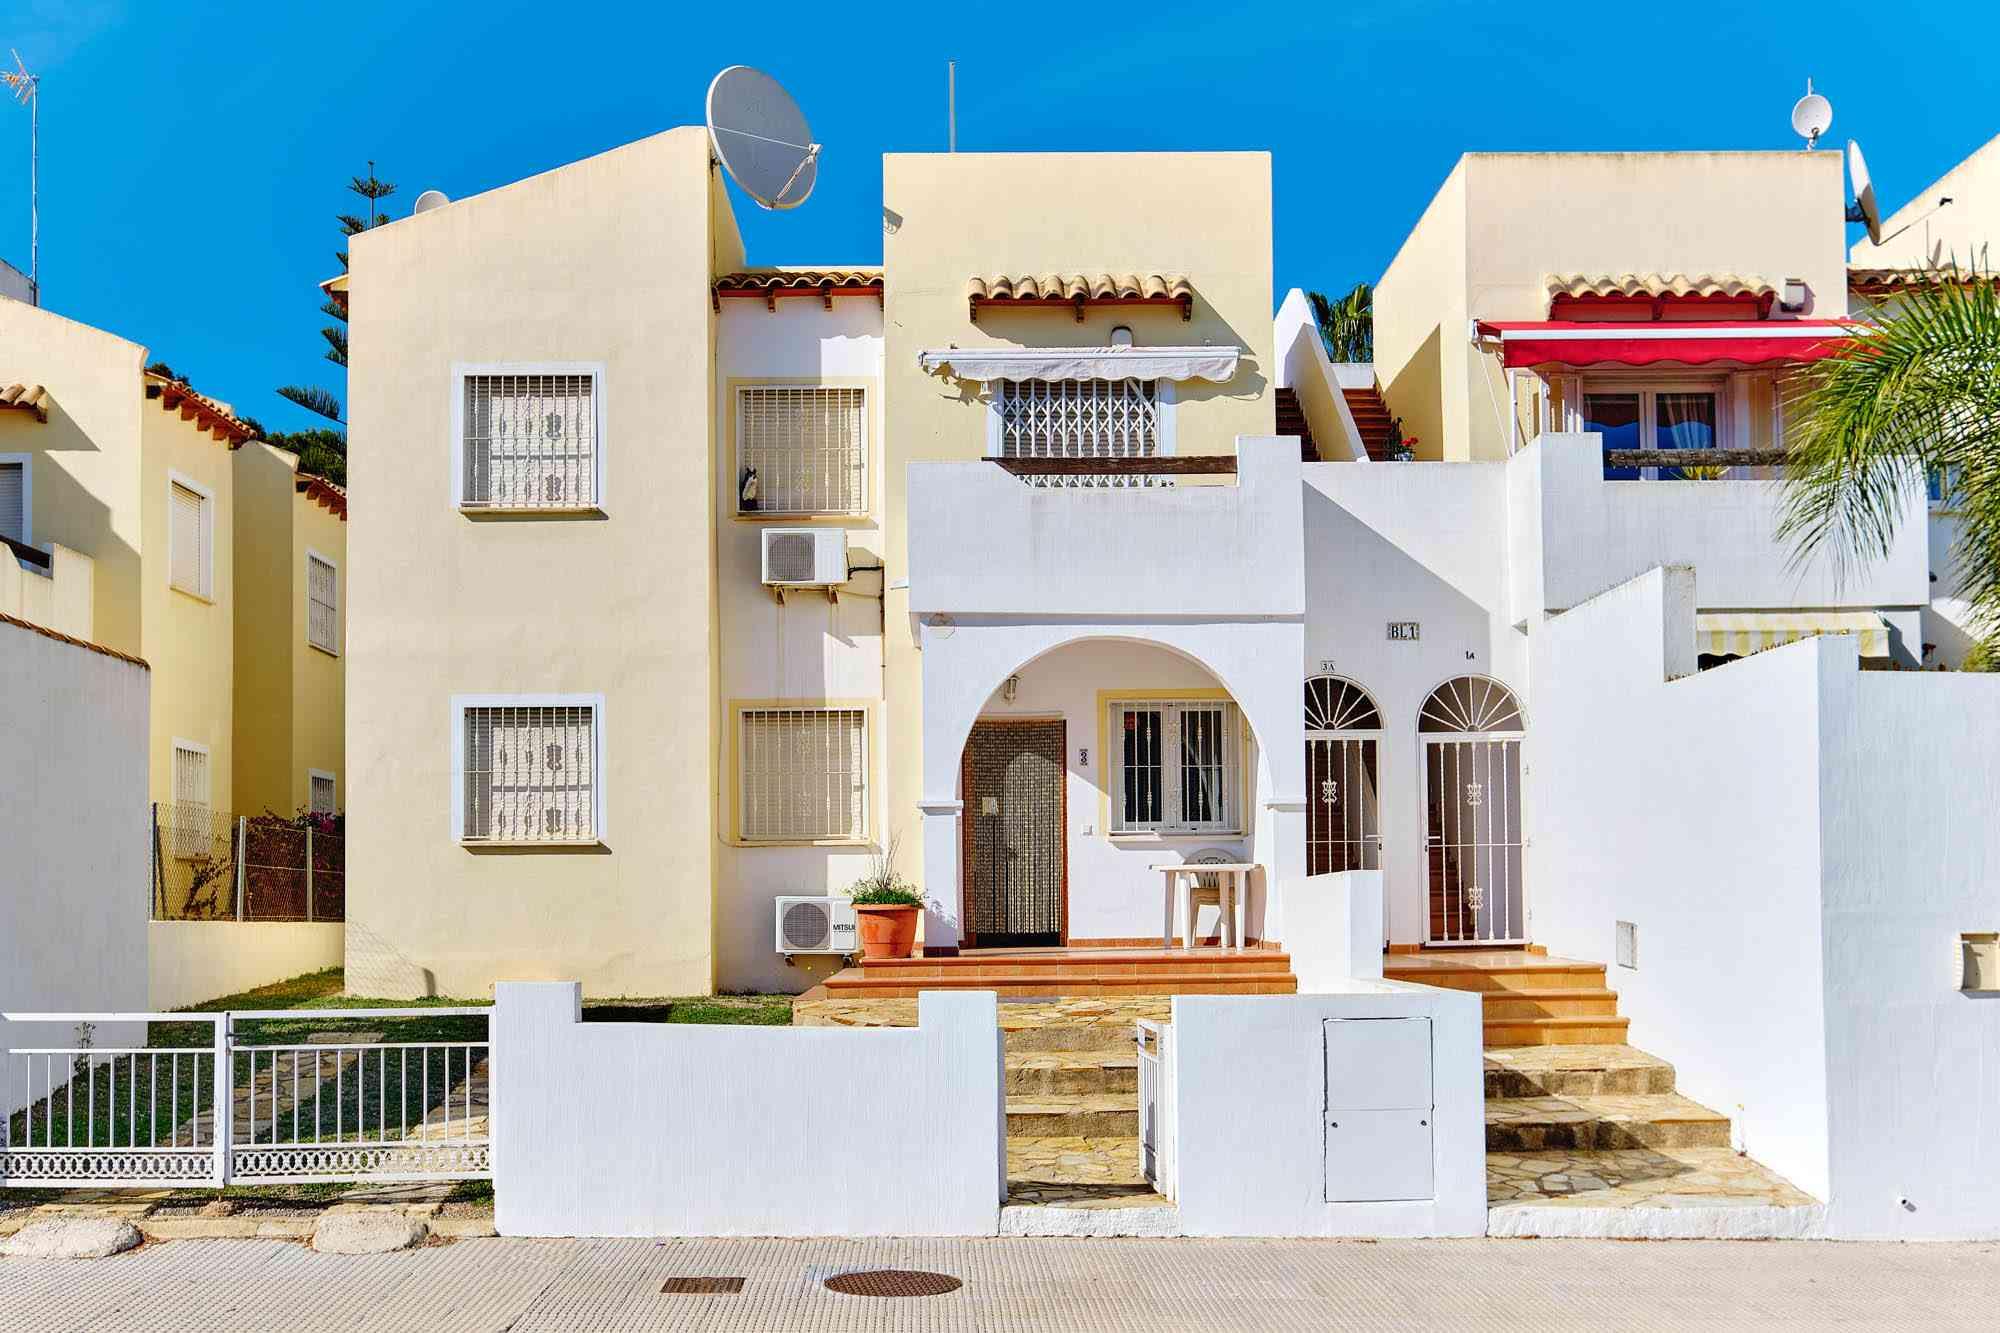 3 bedroom apartment / flat for sale in Orihuela Costa, Costa Blanca